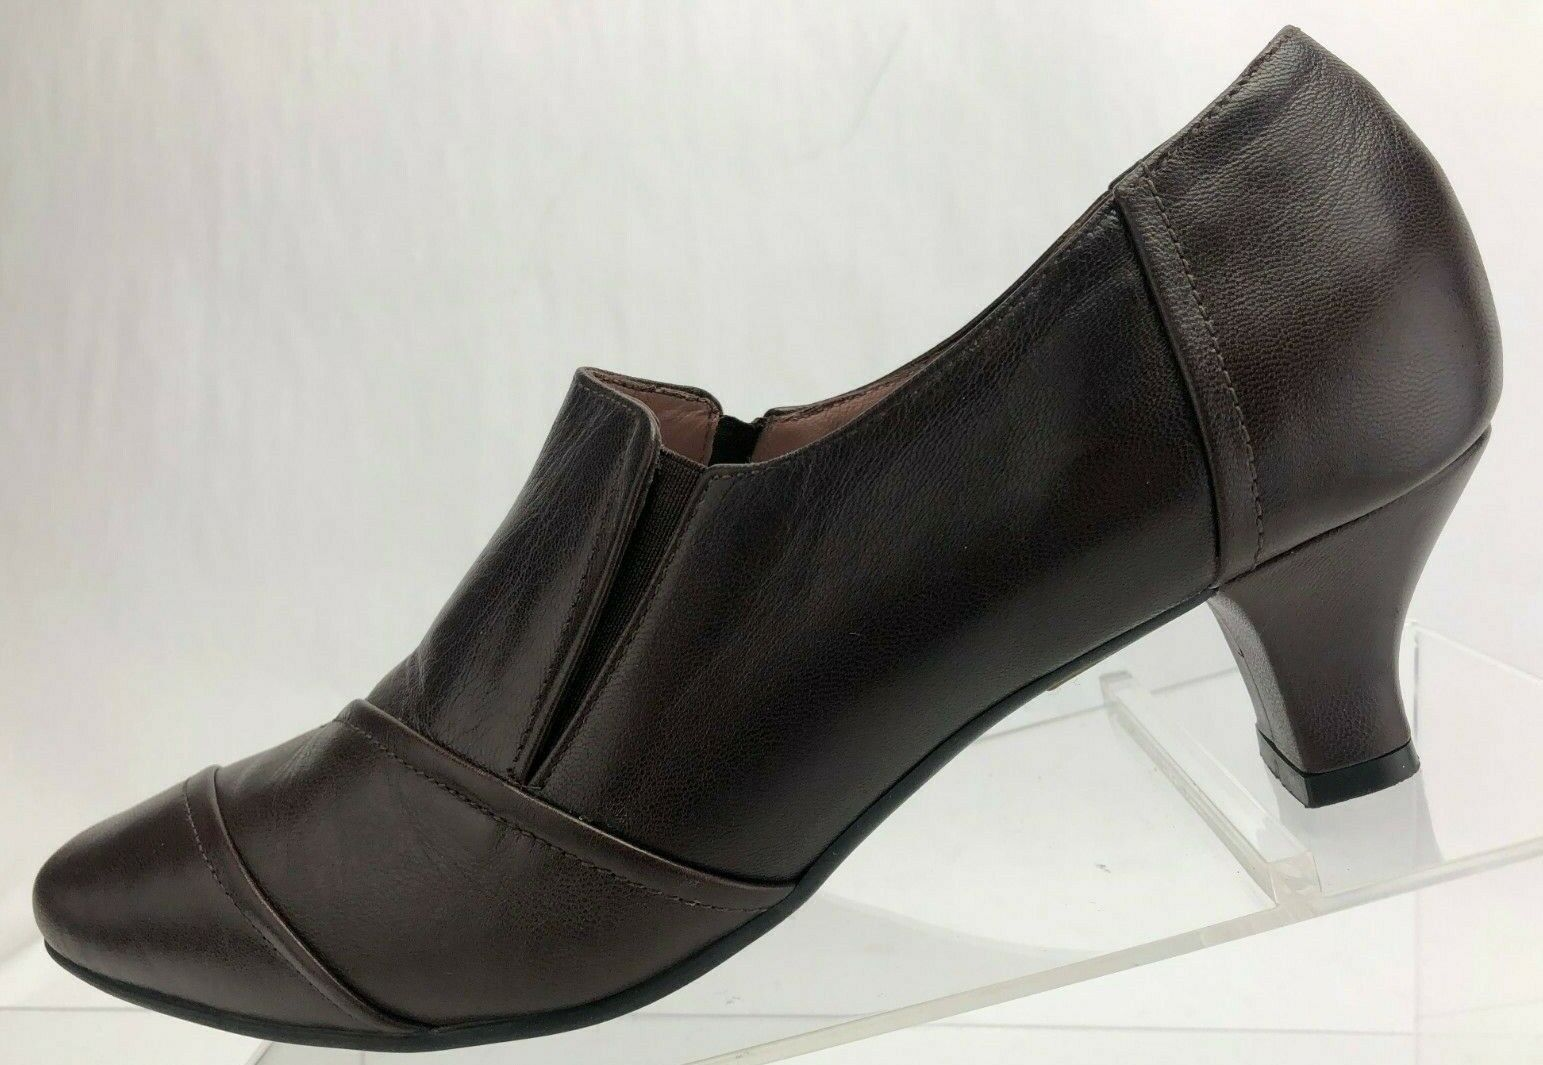 fino al 60% di sconto BeautiFeel Pumps Pumps Pumps rosaline Classic Marrone Leather Dress avvioies donna 39 US 8,8.5  molte sorprese